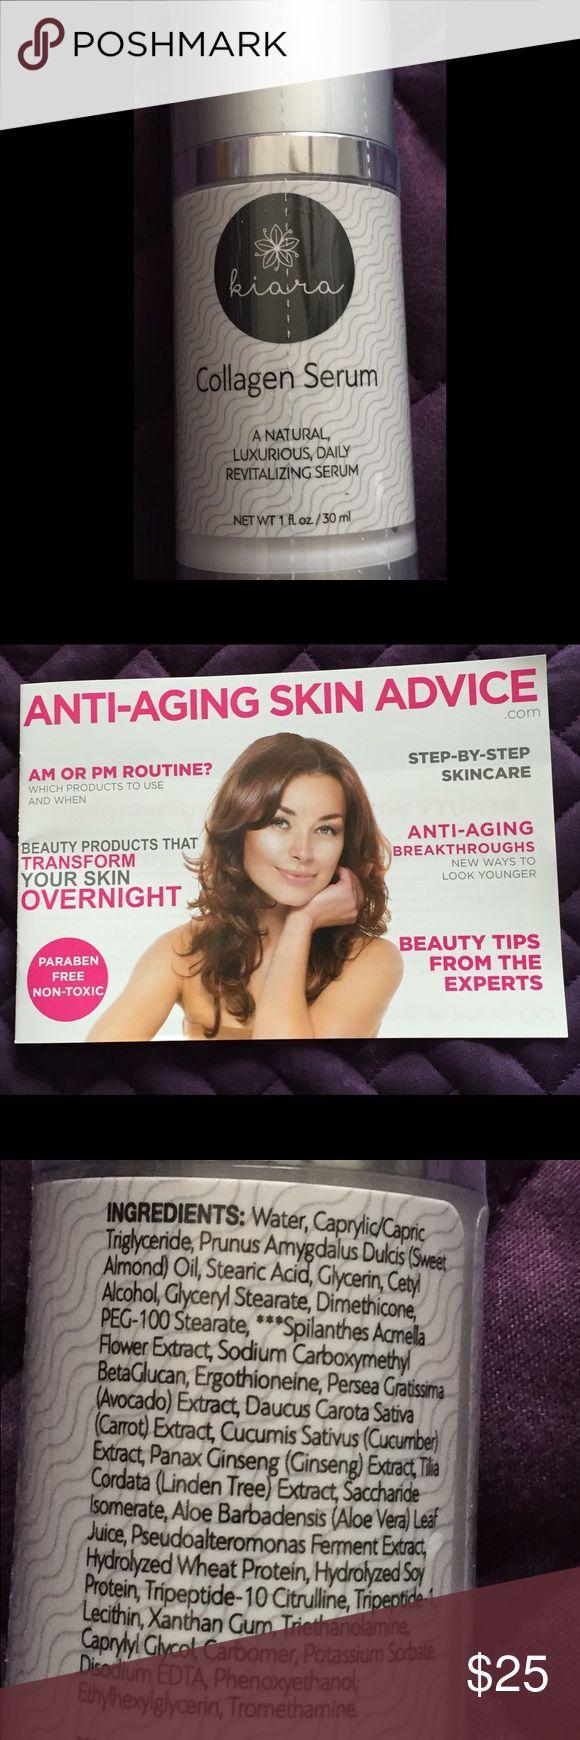 Kiara Collagen Serum Look younger with this Kiara Collagen Serum. Paraben Free, non toxic, comes with an anti-aging skin booklet. kiara Makeup